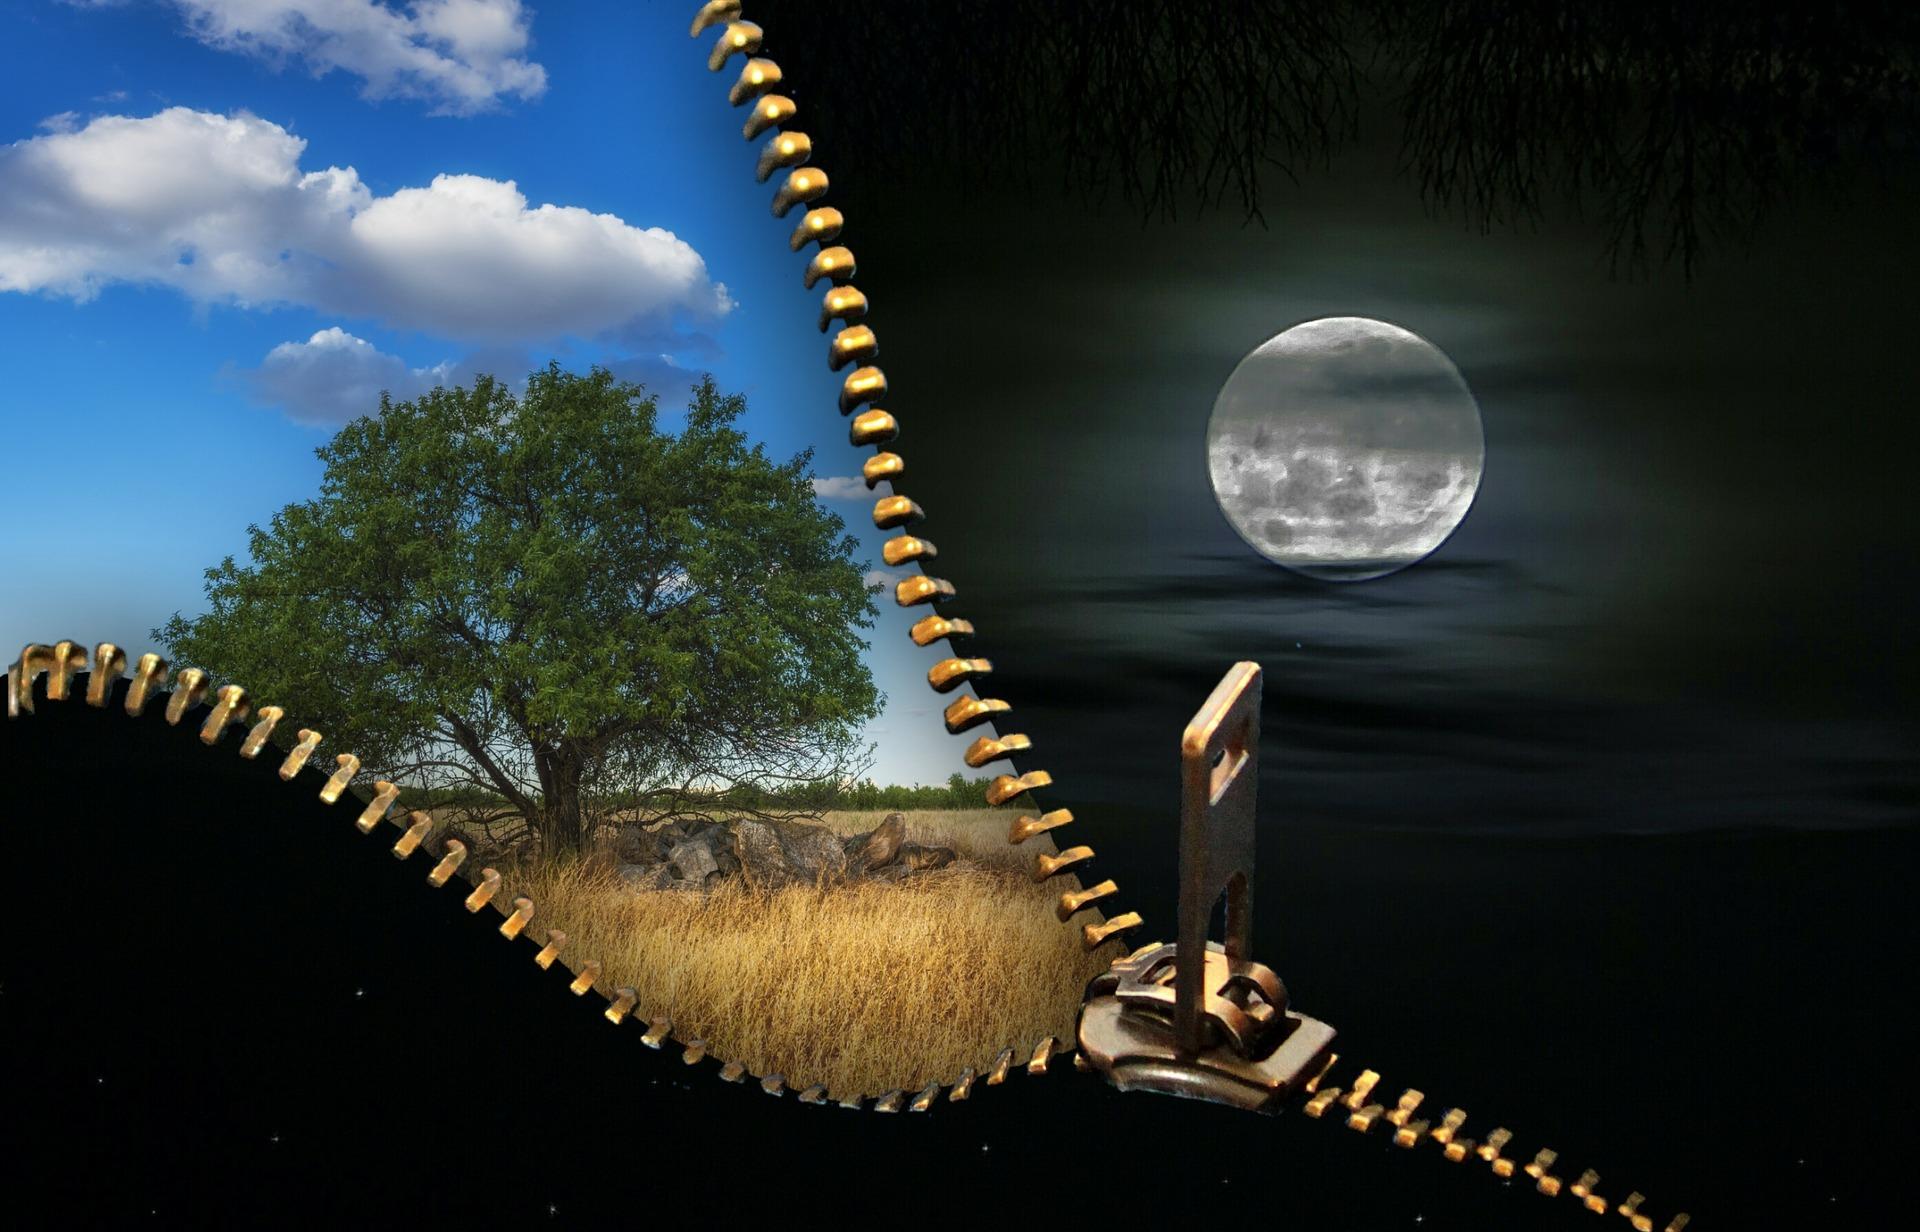 Mondkraft heute 22. September 2021 mit Mondkalender – Sonne in Waage - Herbstbeginn